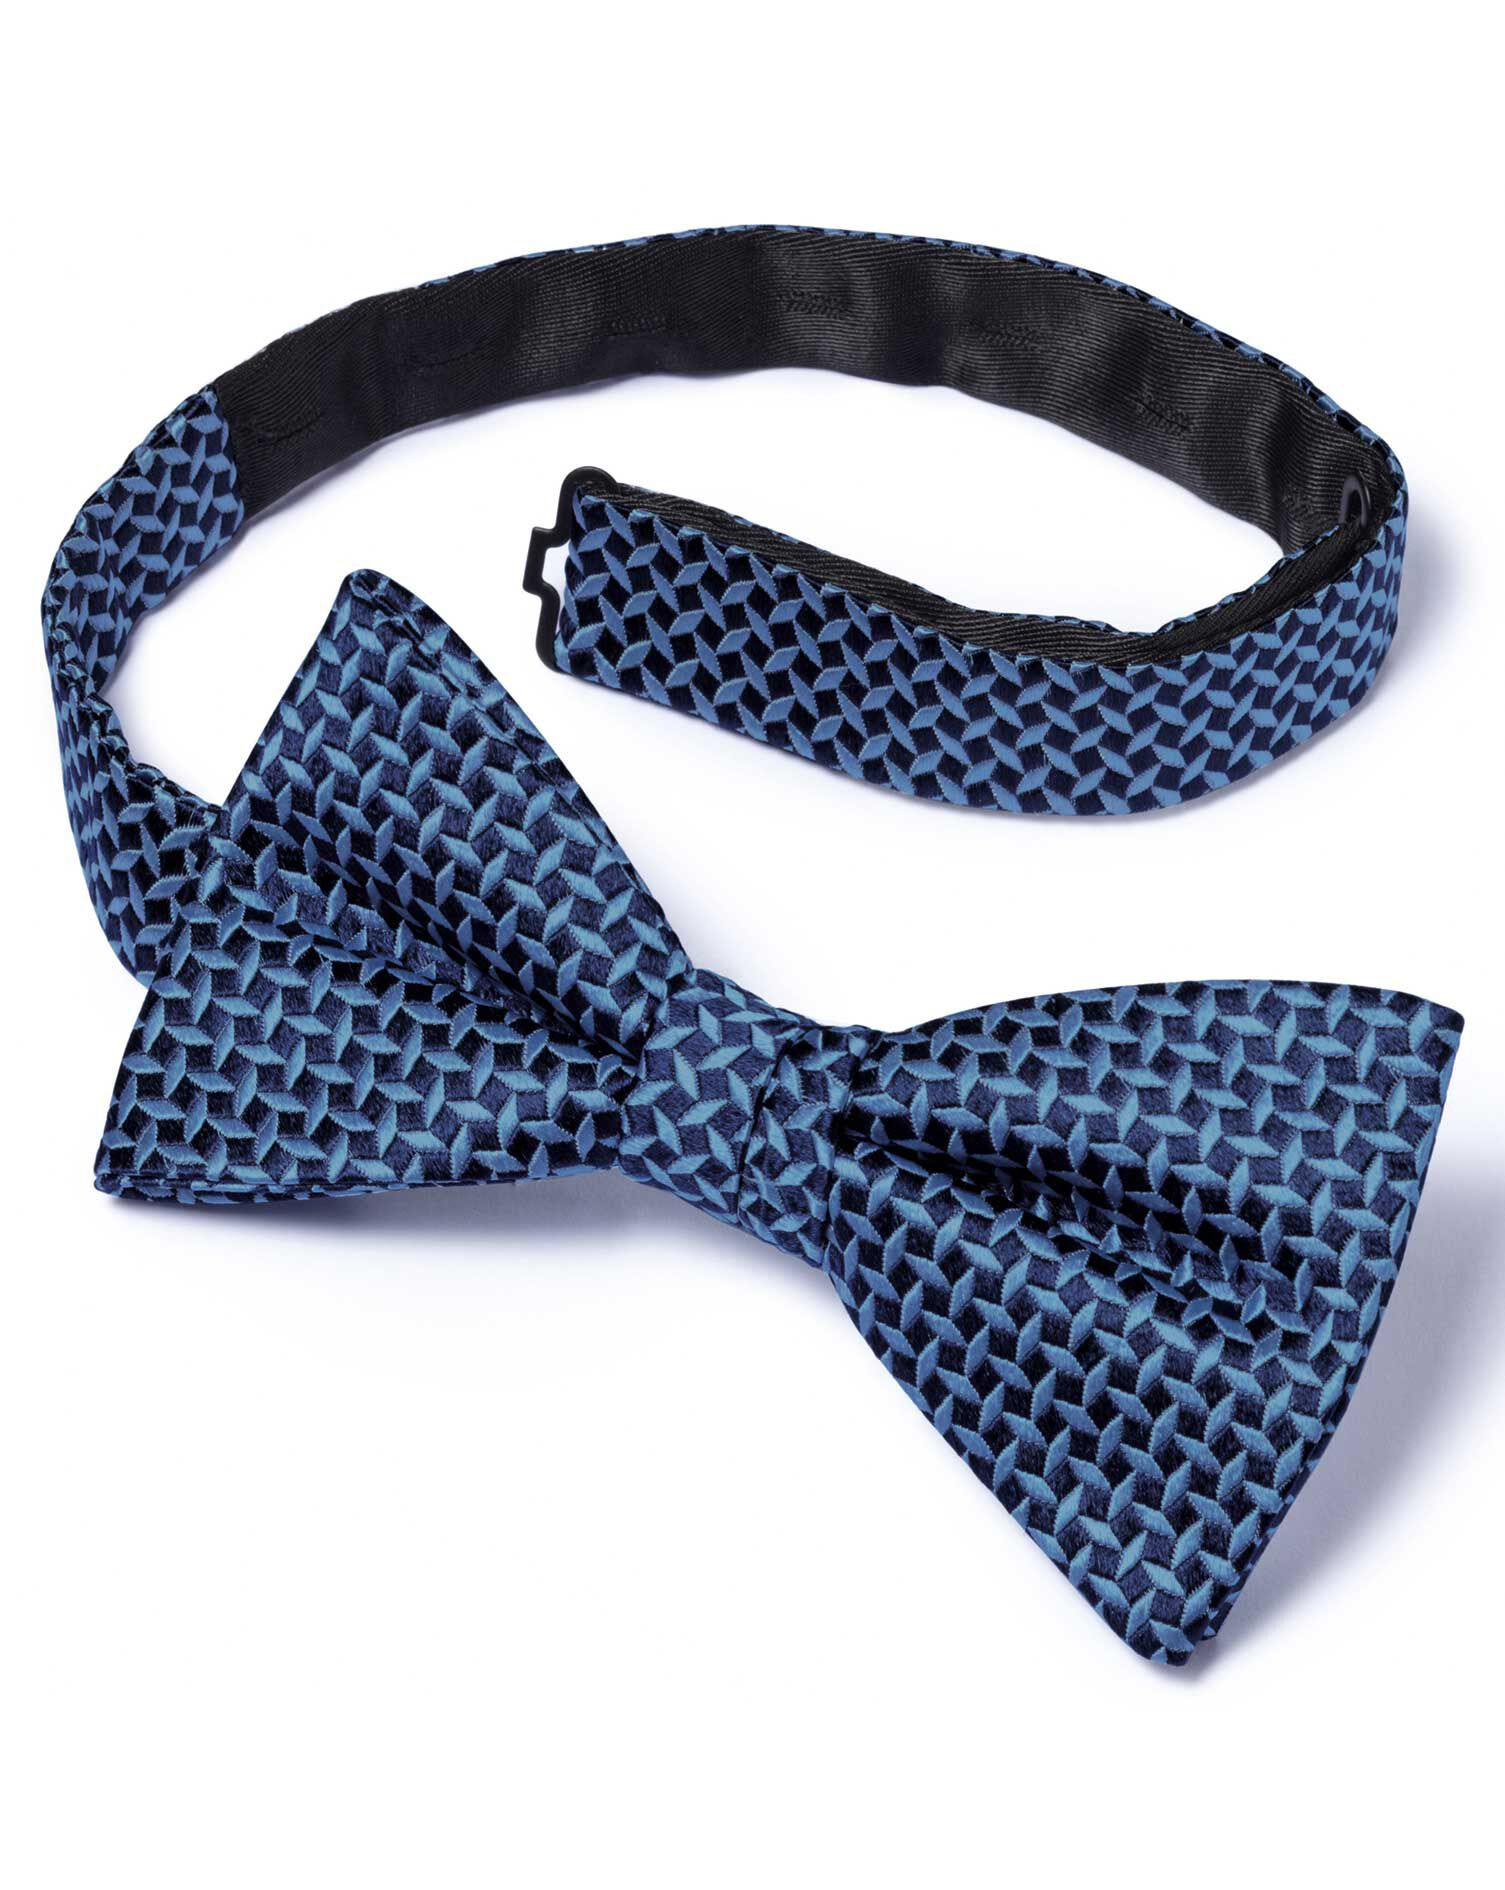 Blue Silk Diamond Lattice Classic Ready-Tied Bow Tie Size OSFA by Charles Tyrwhitt